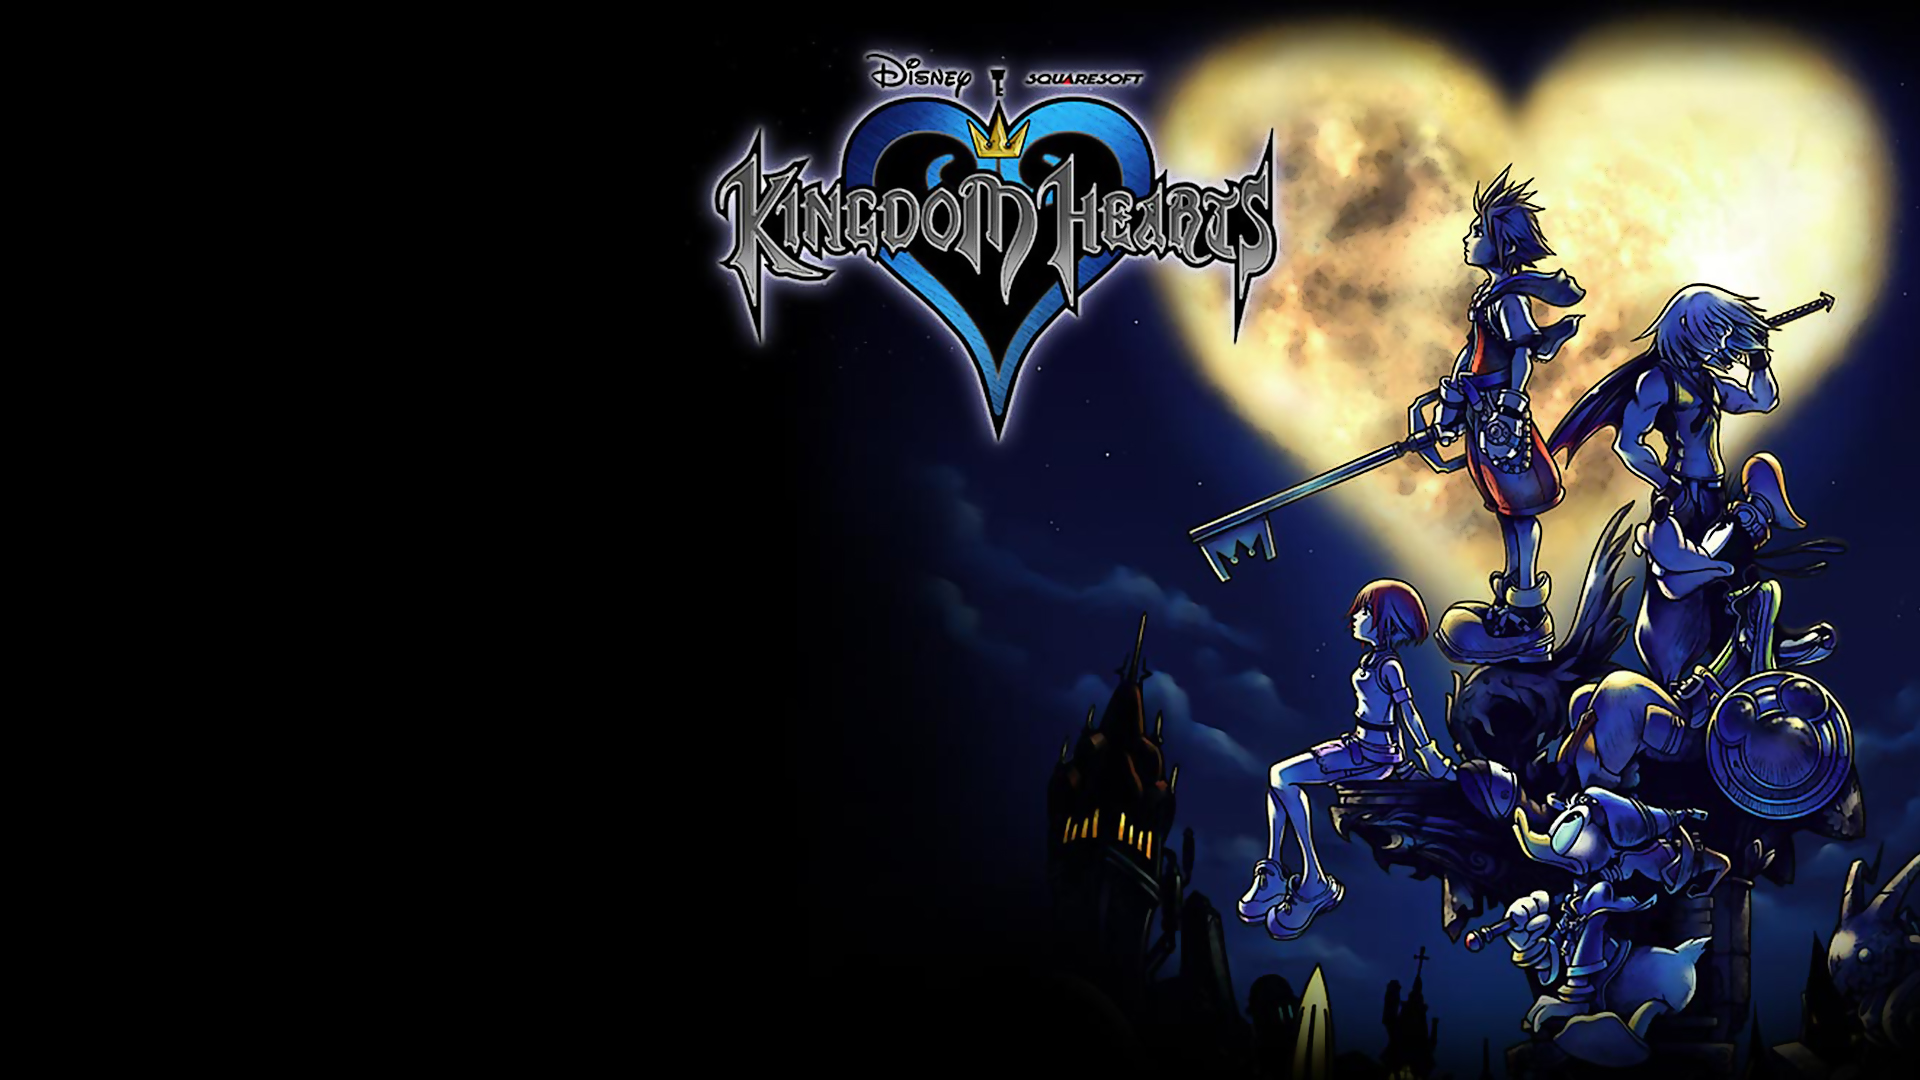 Kingdom Hearts Wallpaper Hd wallpaper   928300 1920x1080